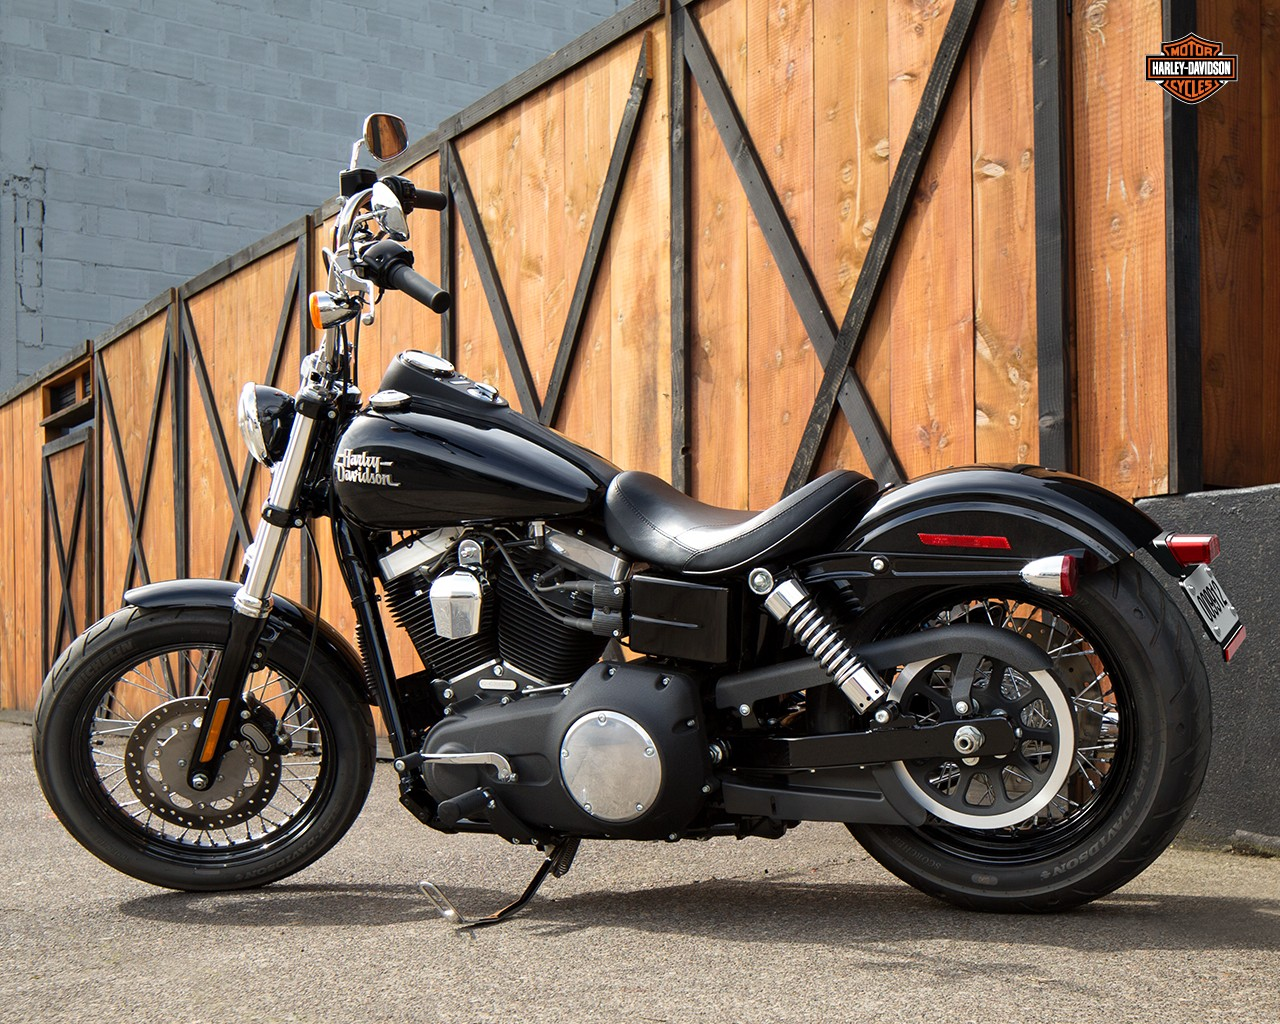 2015 Dyna Street Bob FXDB Bobber Harley Davidson Australia 1280x1024